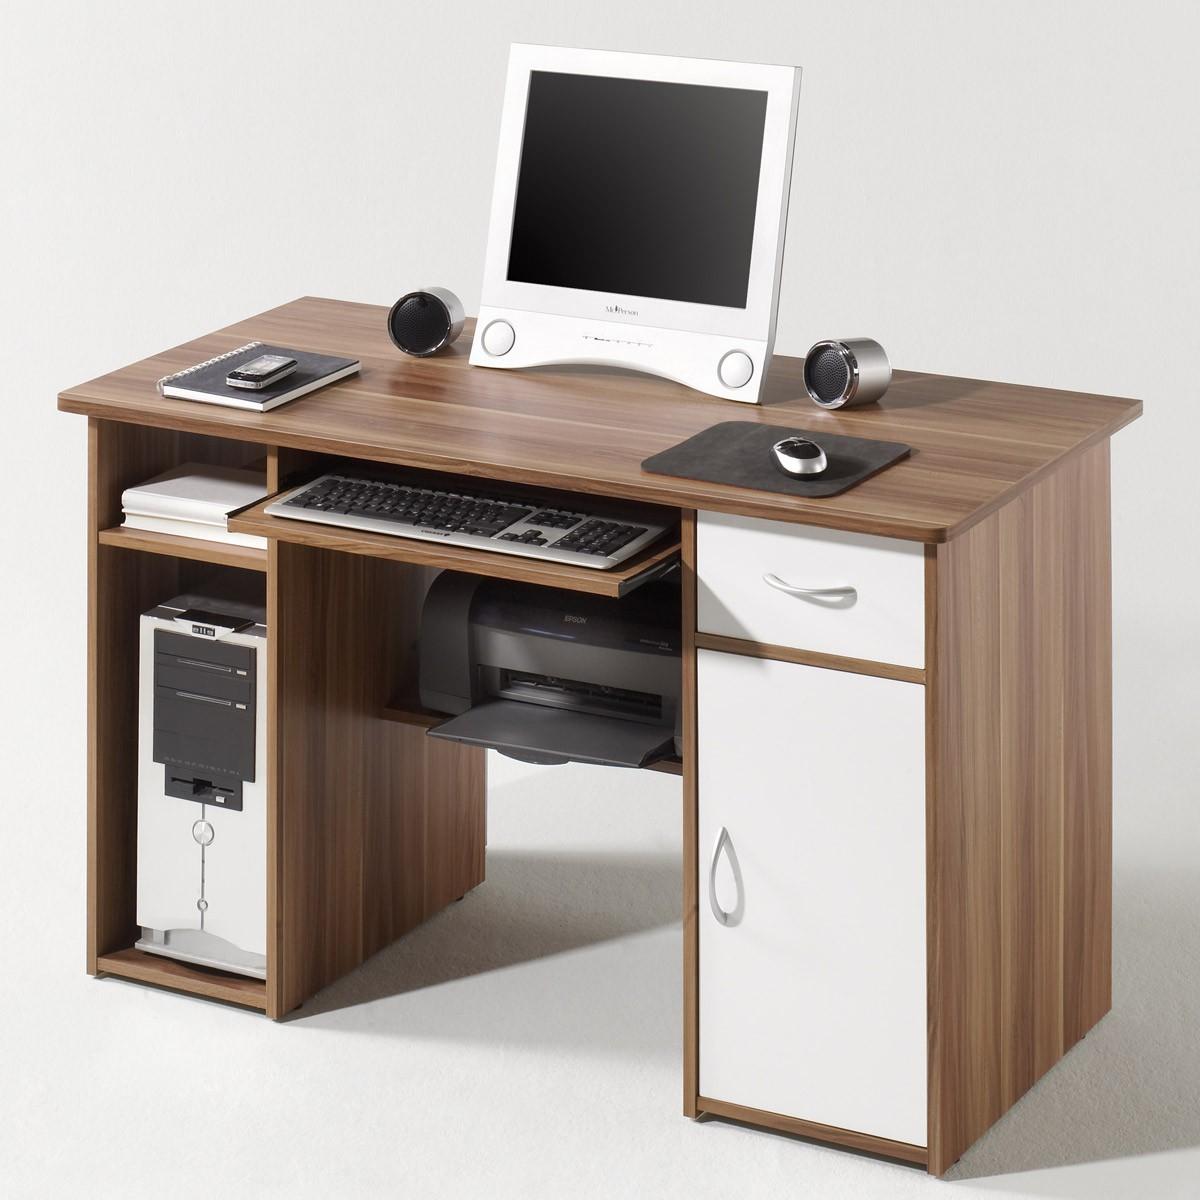 pc tisch coronel in walnuss front weiss b2b trade. Black Bedroom Furniture Sets. Home Design Ideas